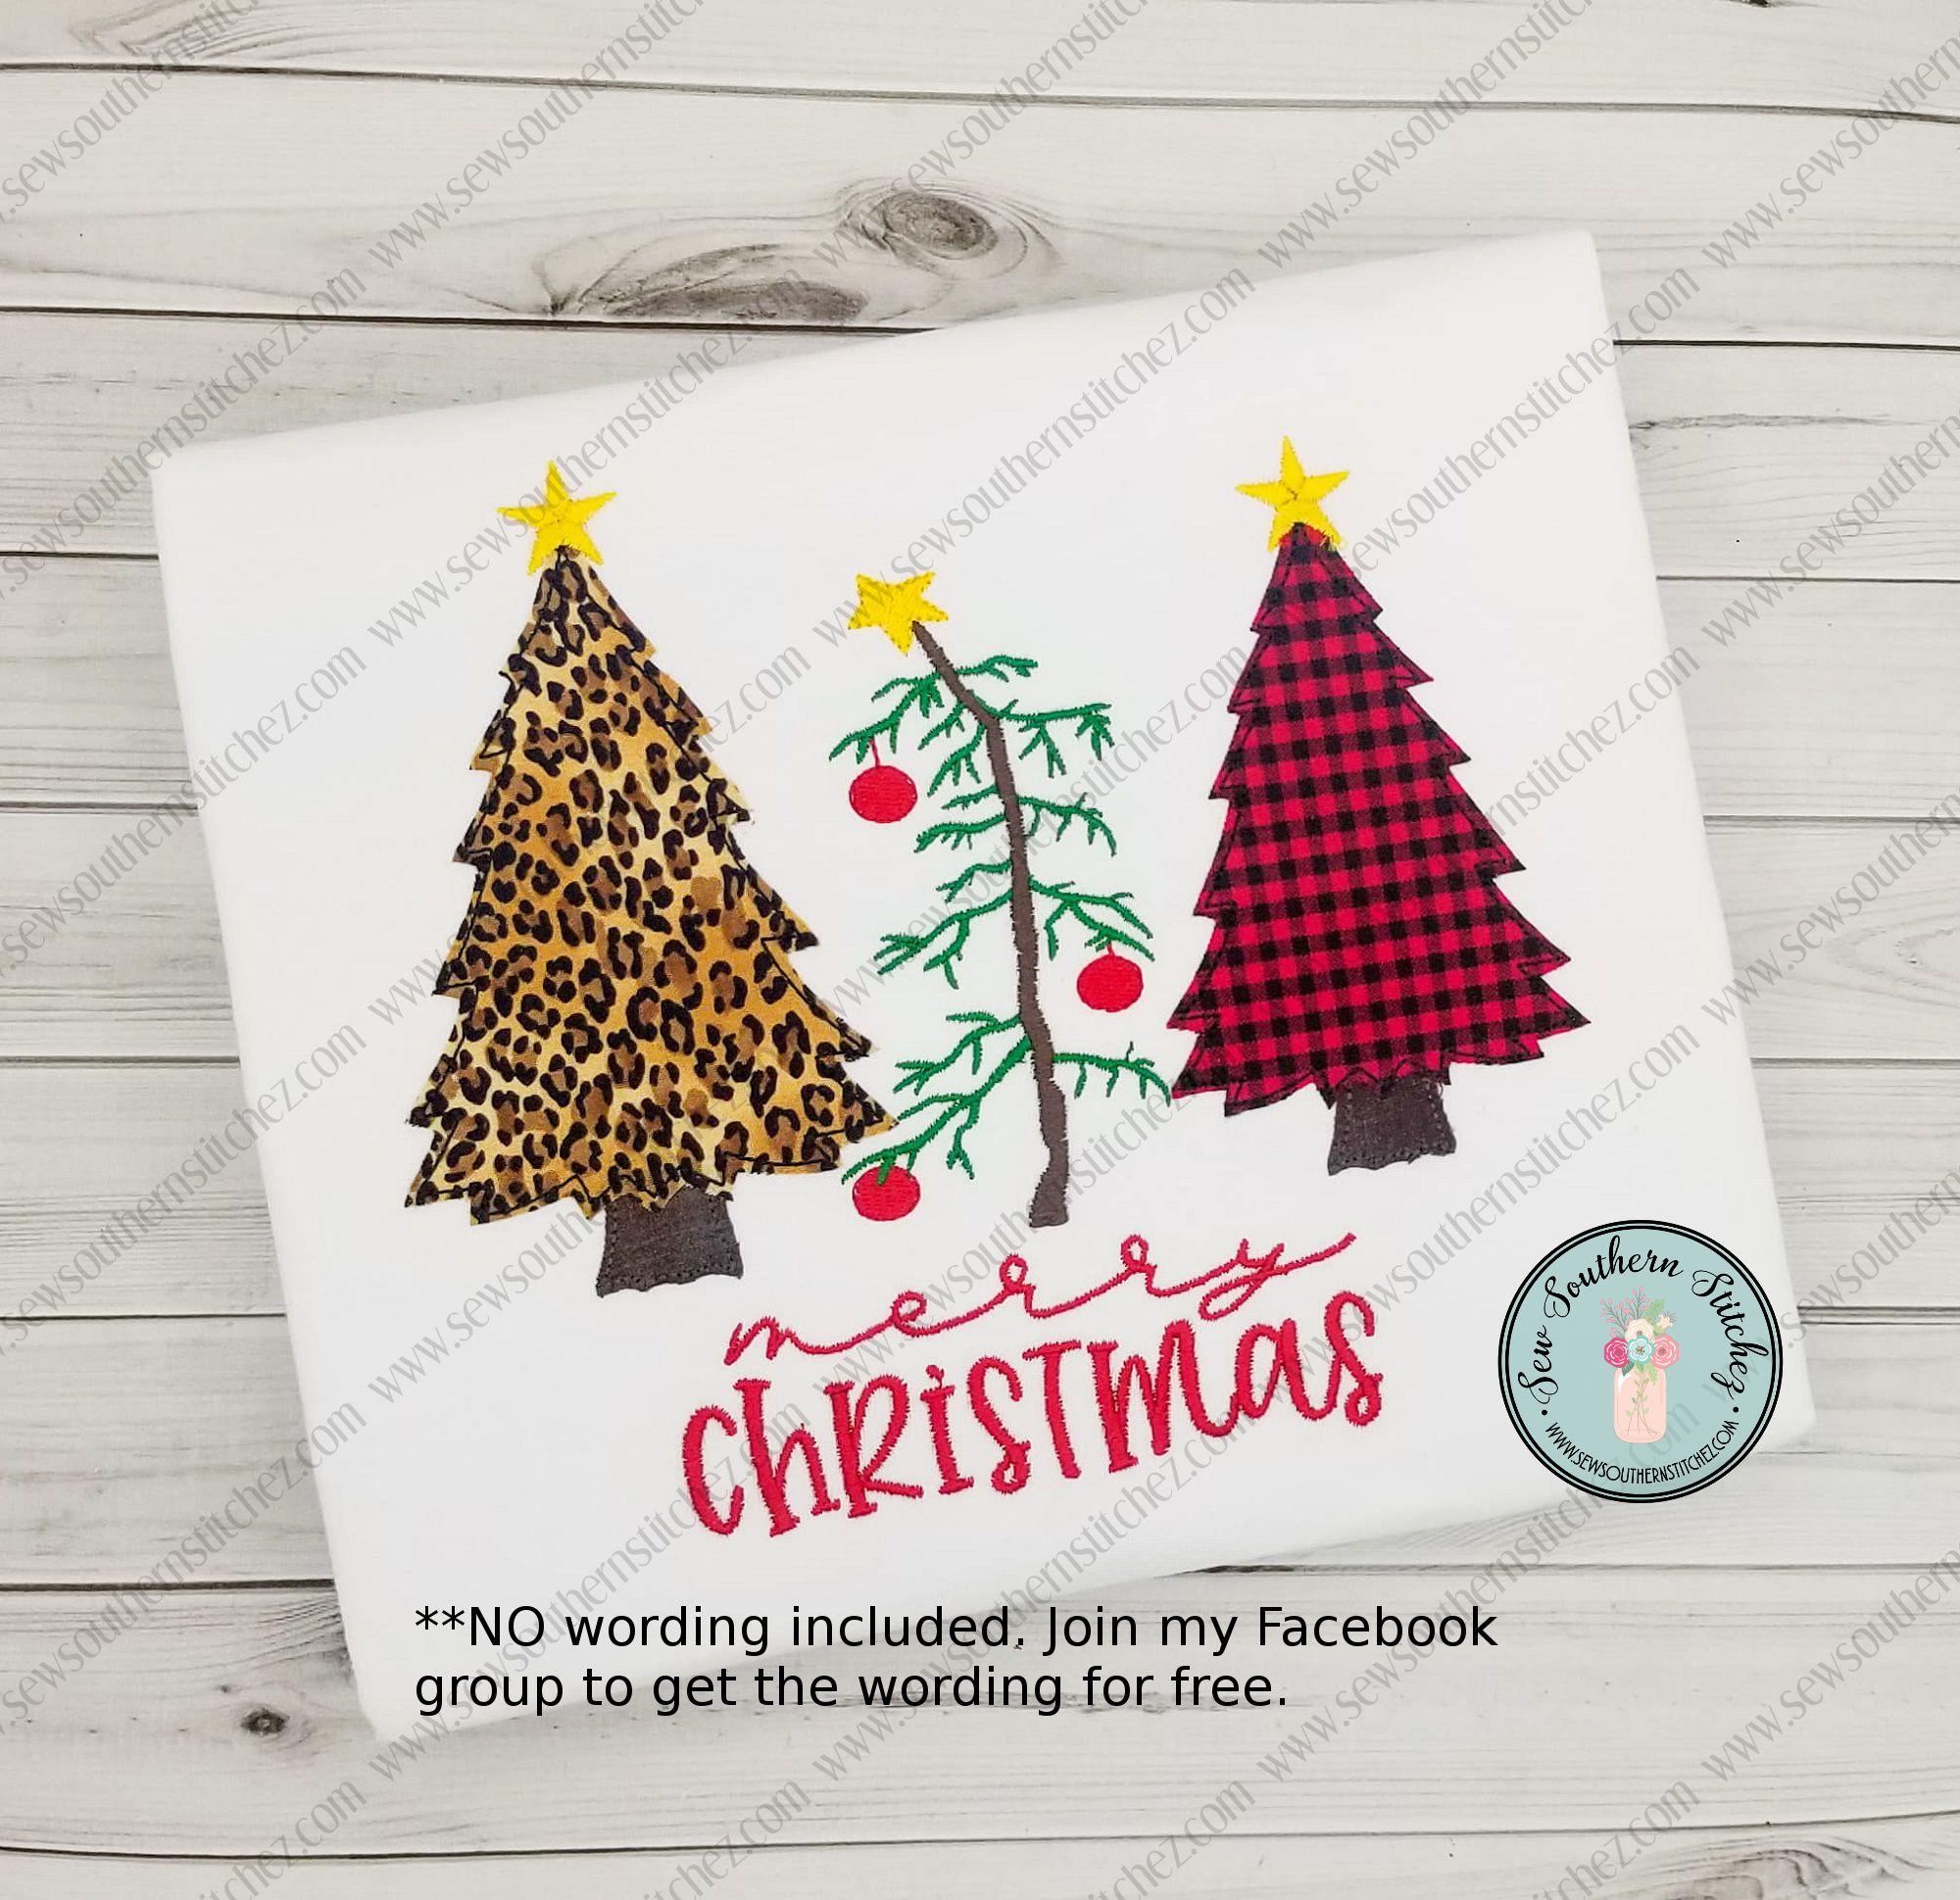 Raggedy Christmas Tree Trio Applique Design 2 Applique Tre In 2020 Charlie Brown Tree Applique Designs Christmas Tree Truck